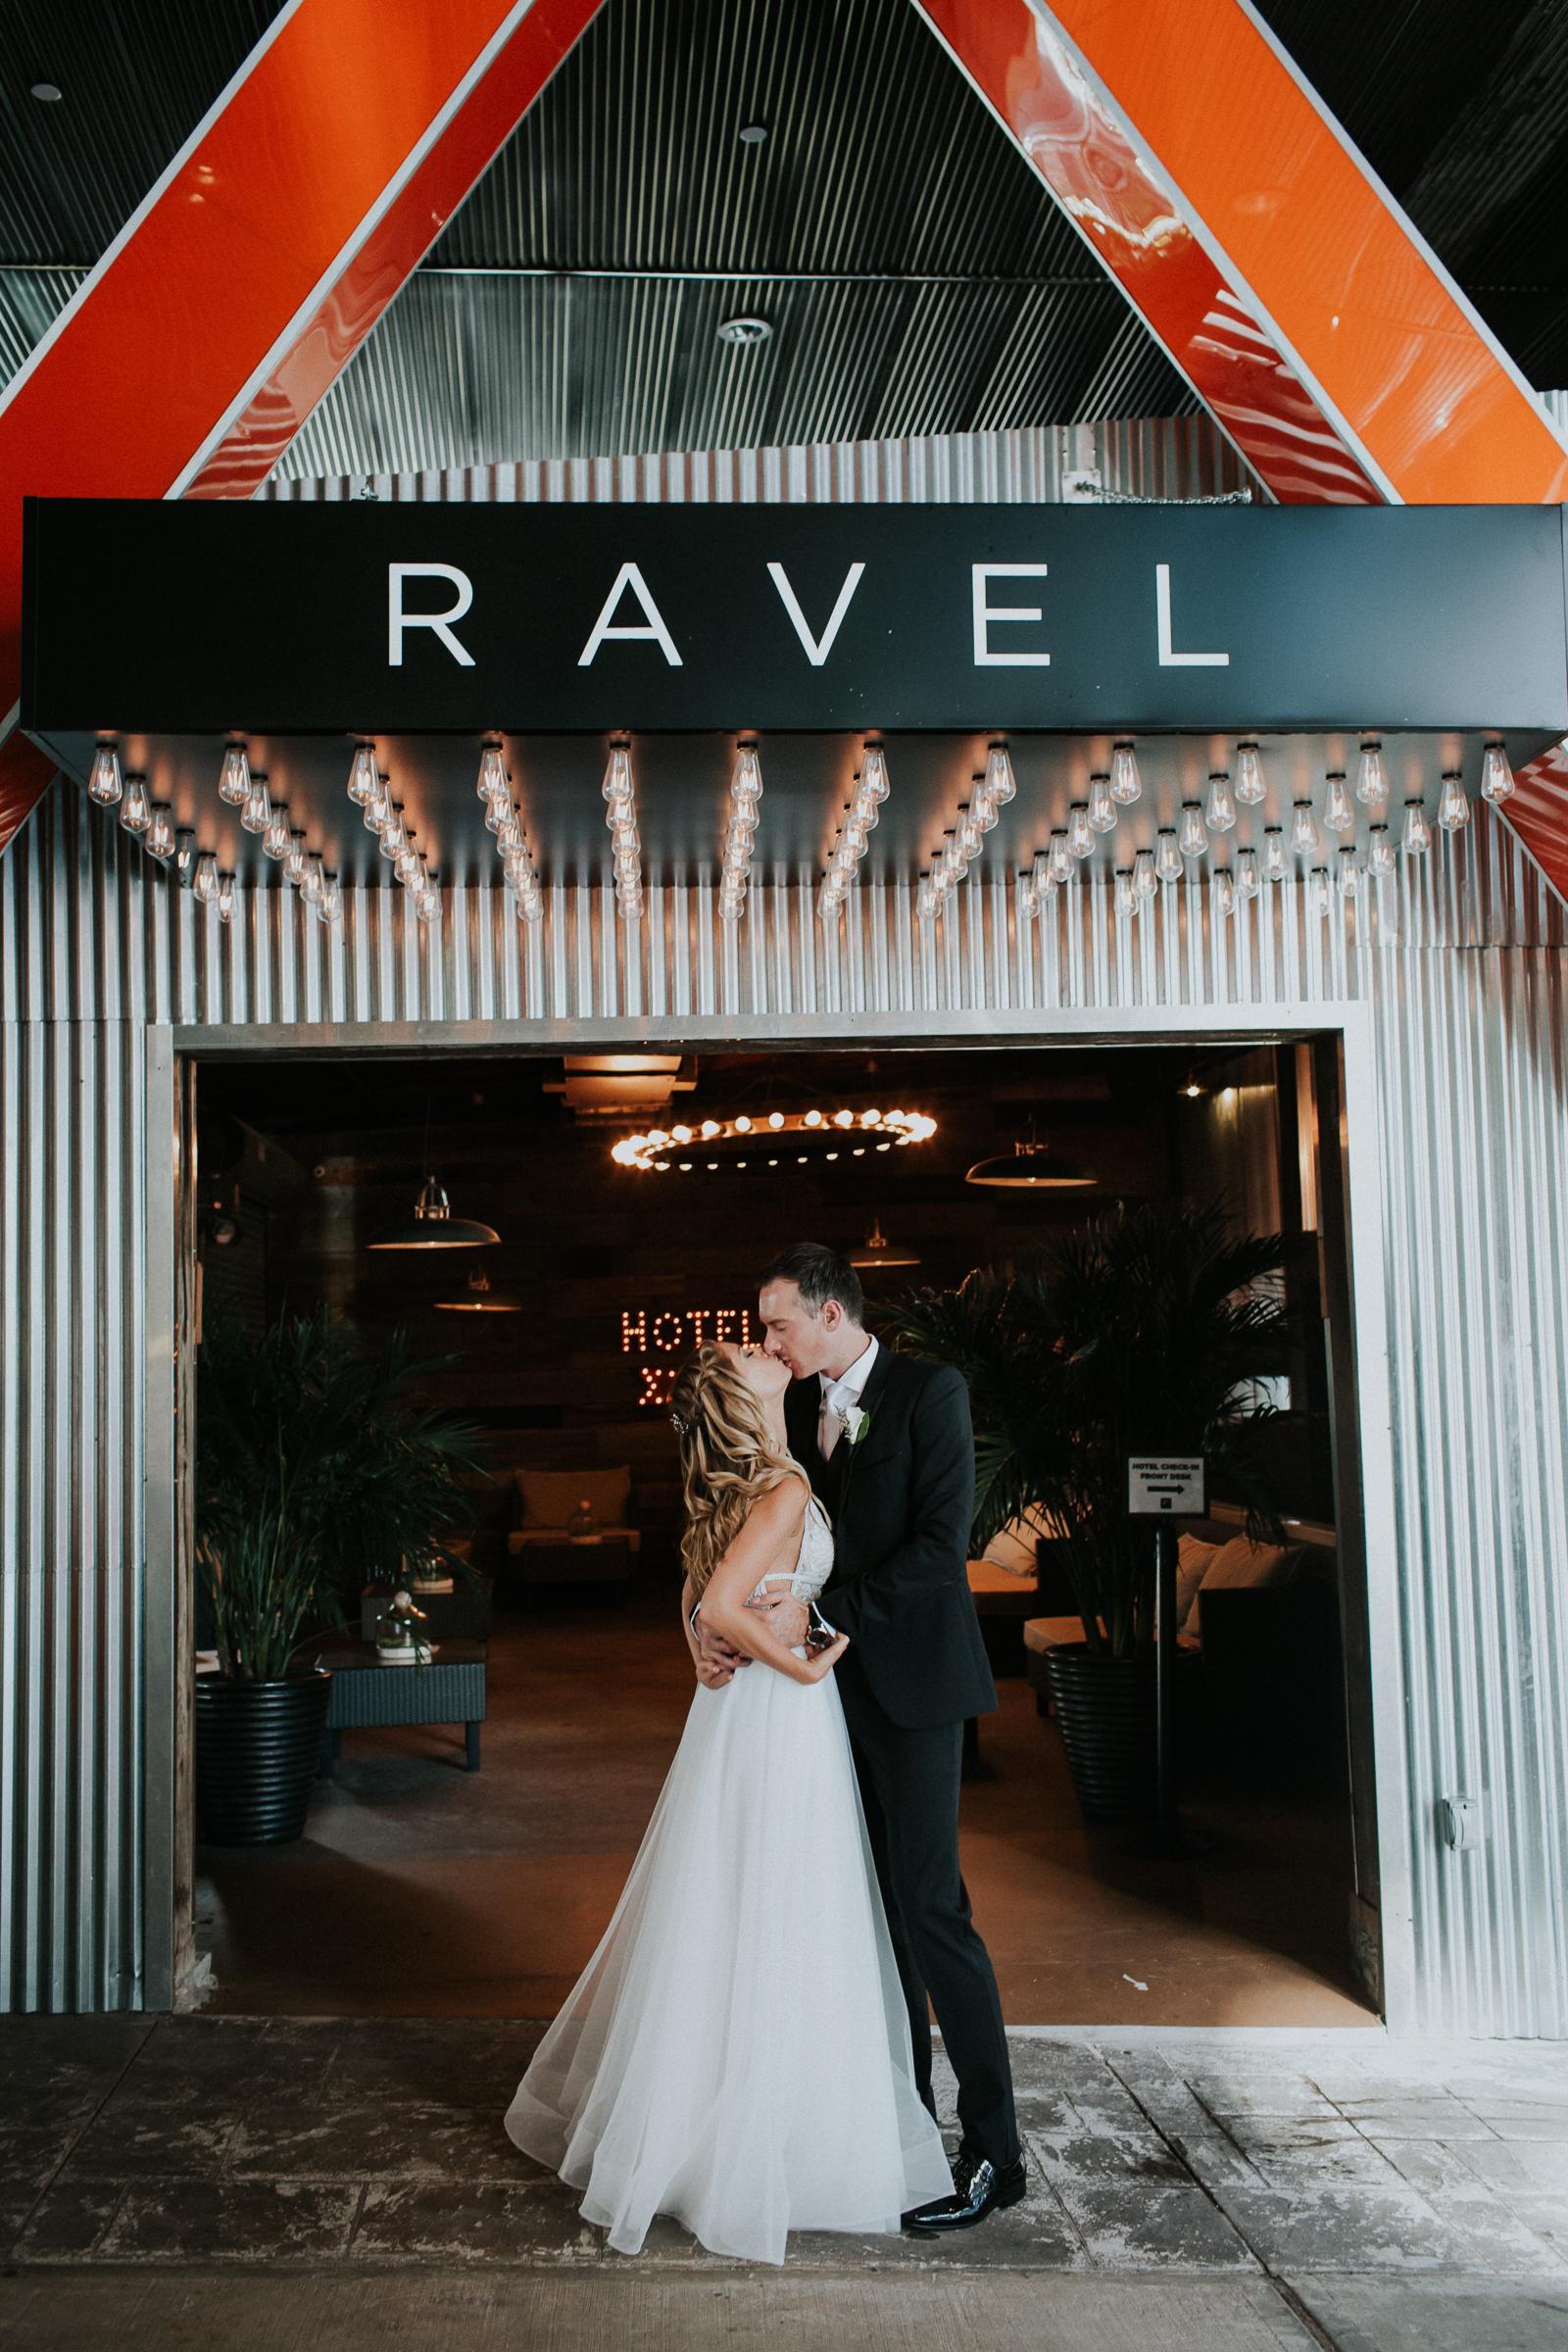 Ravel-Hotel-Penthouse-808-Long-Island-City-New-York-Documentary-Wedding-Photographer-34.jpg